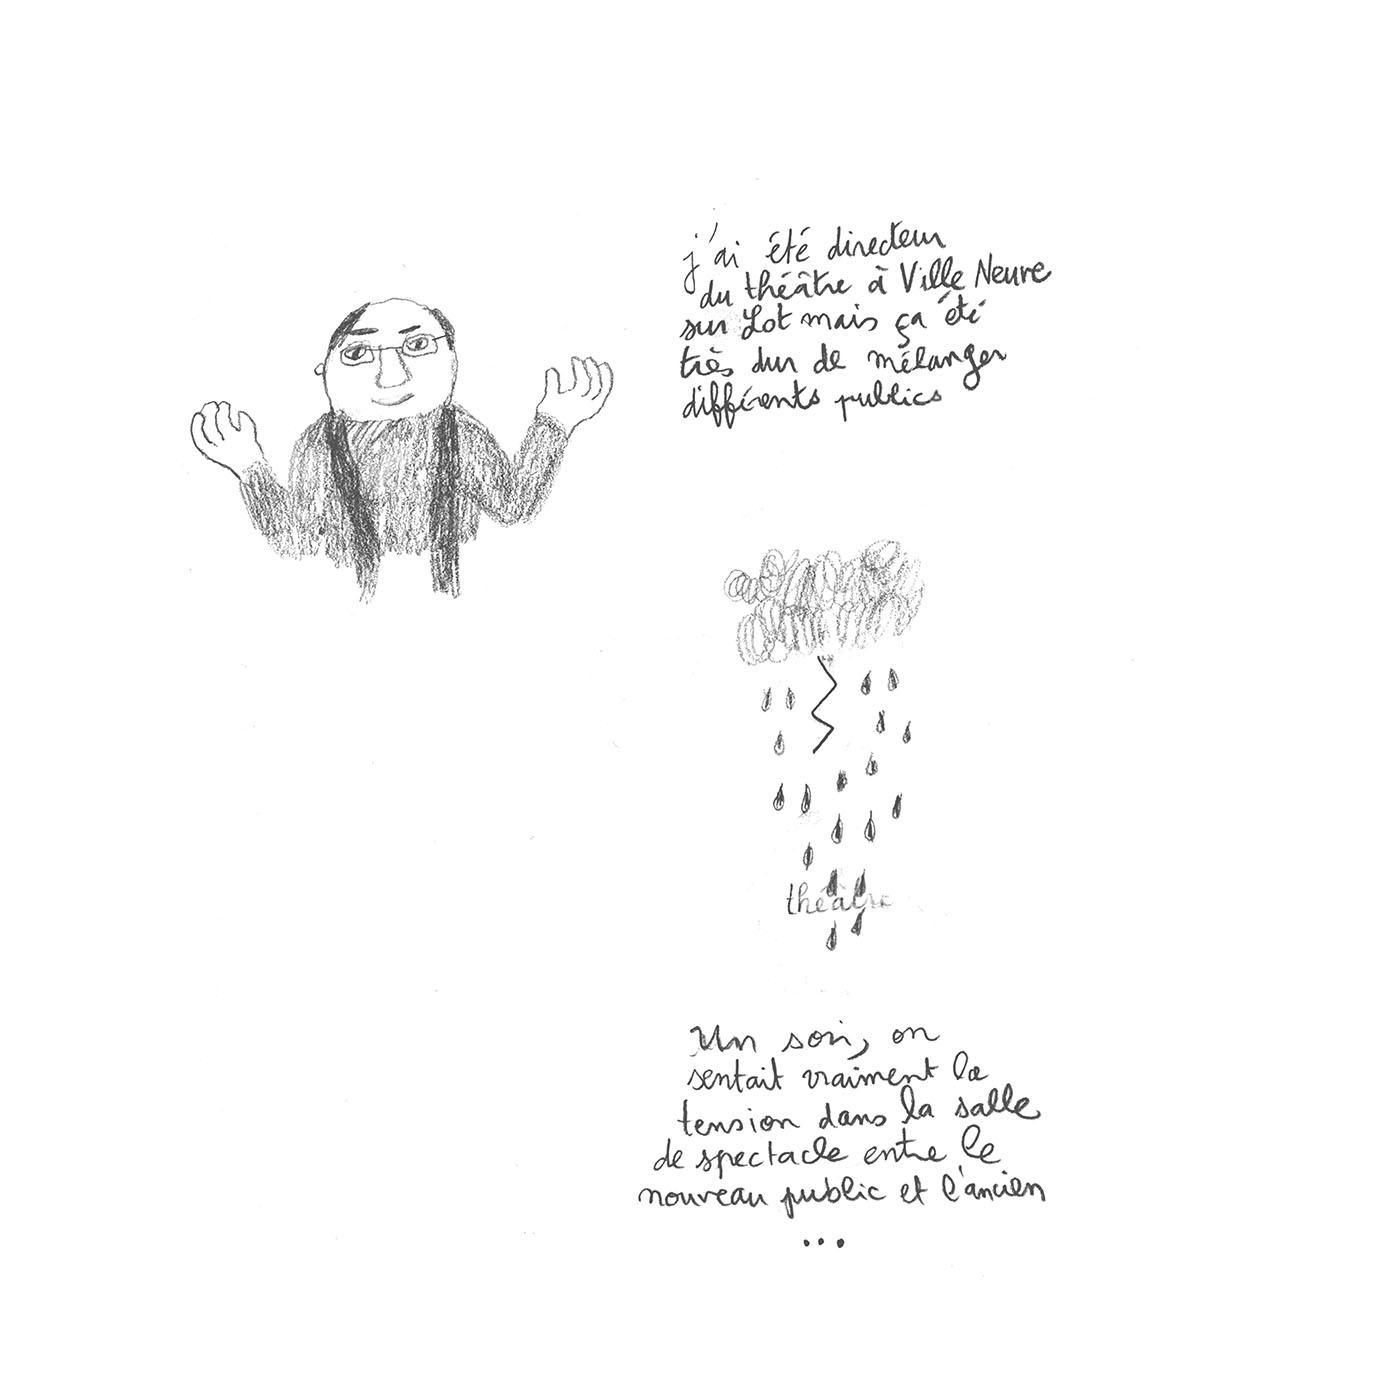 Serge Borras Reveil Creatif illustration5